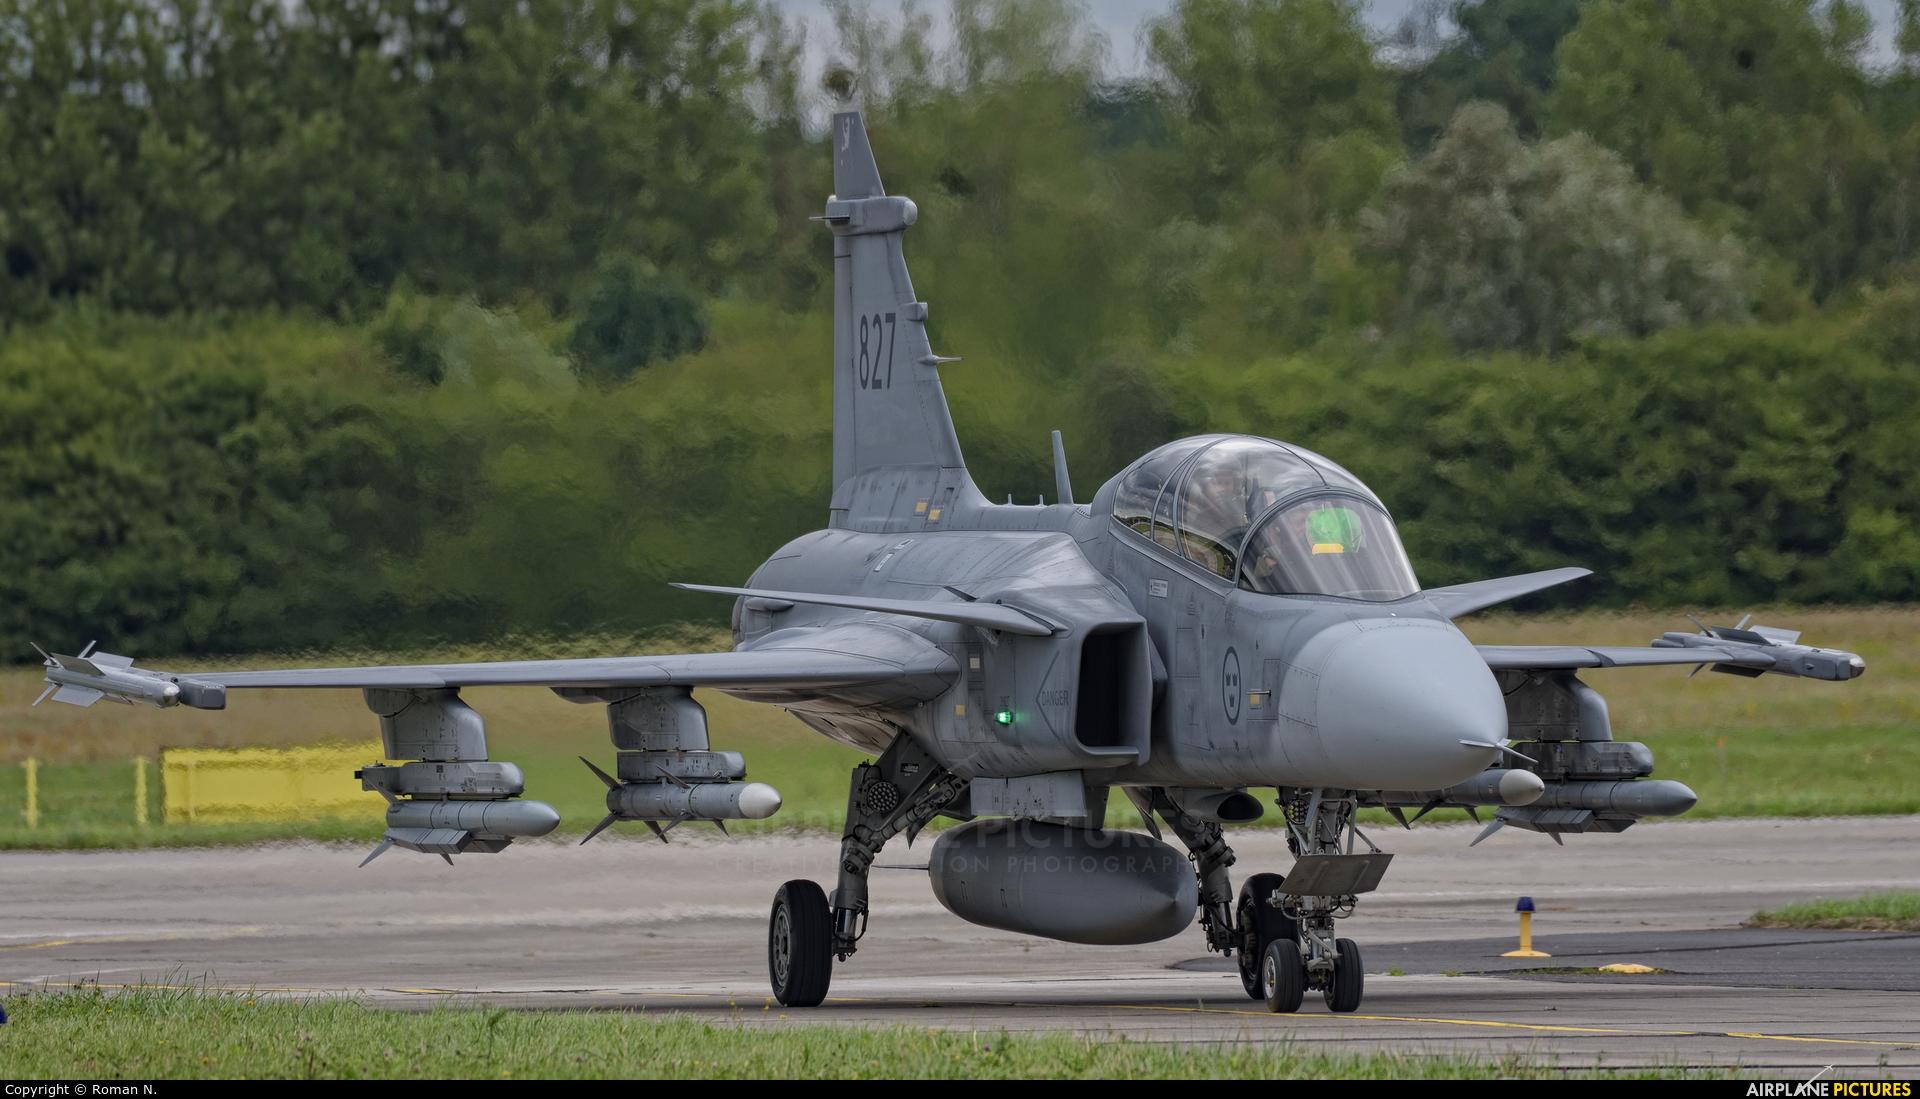 Sweden - Air Force 39827 aircraft at Gdynia- Babie Doły (Oksywie)